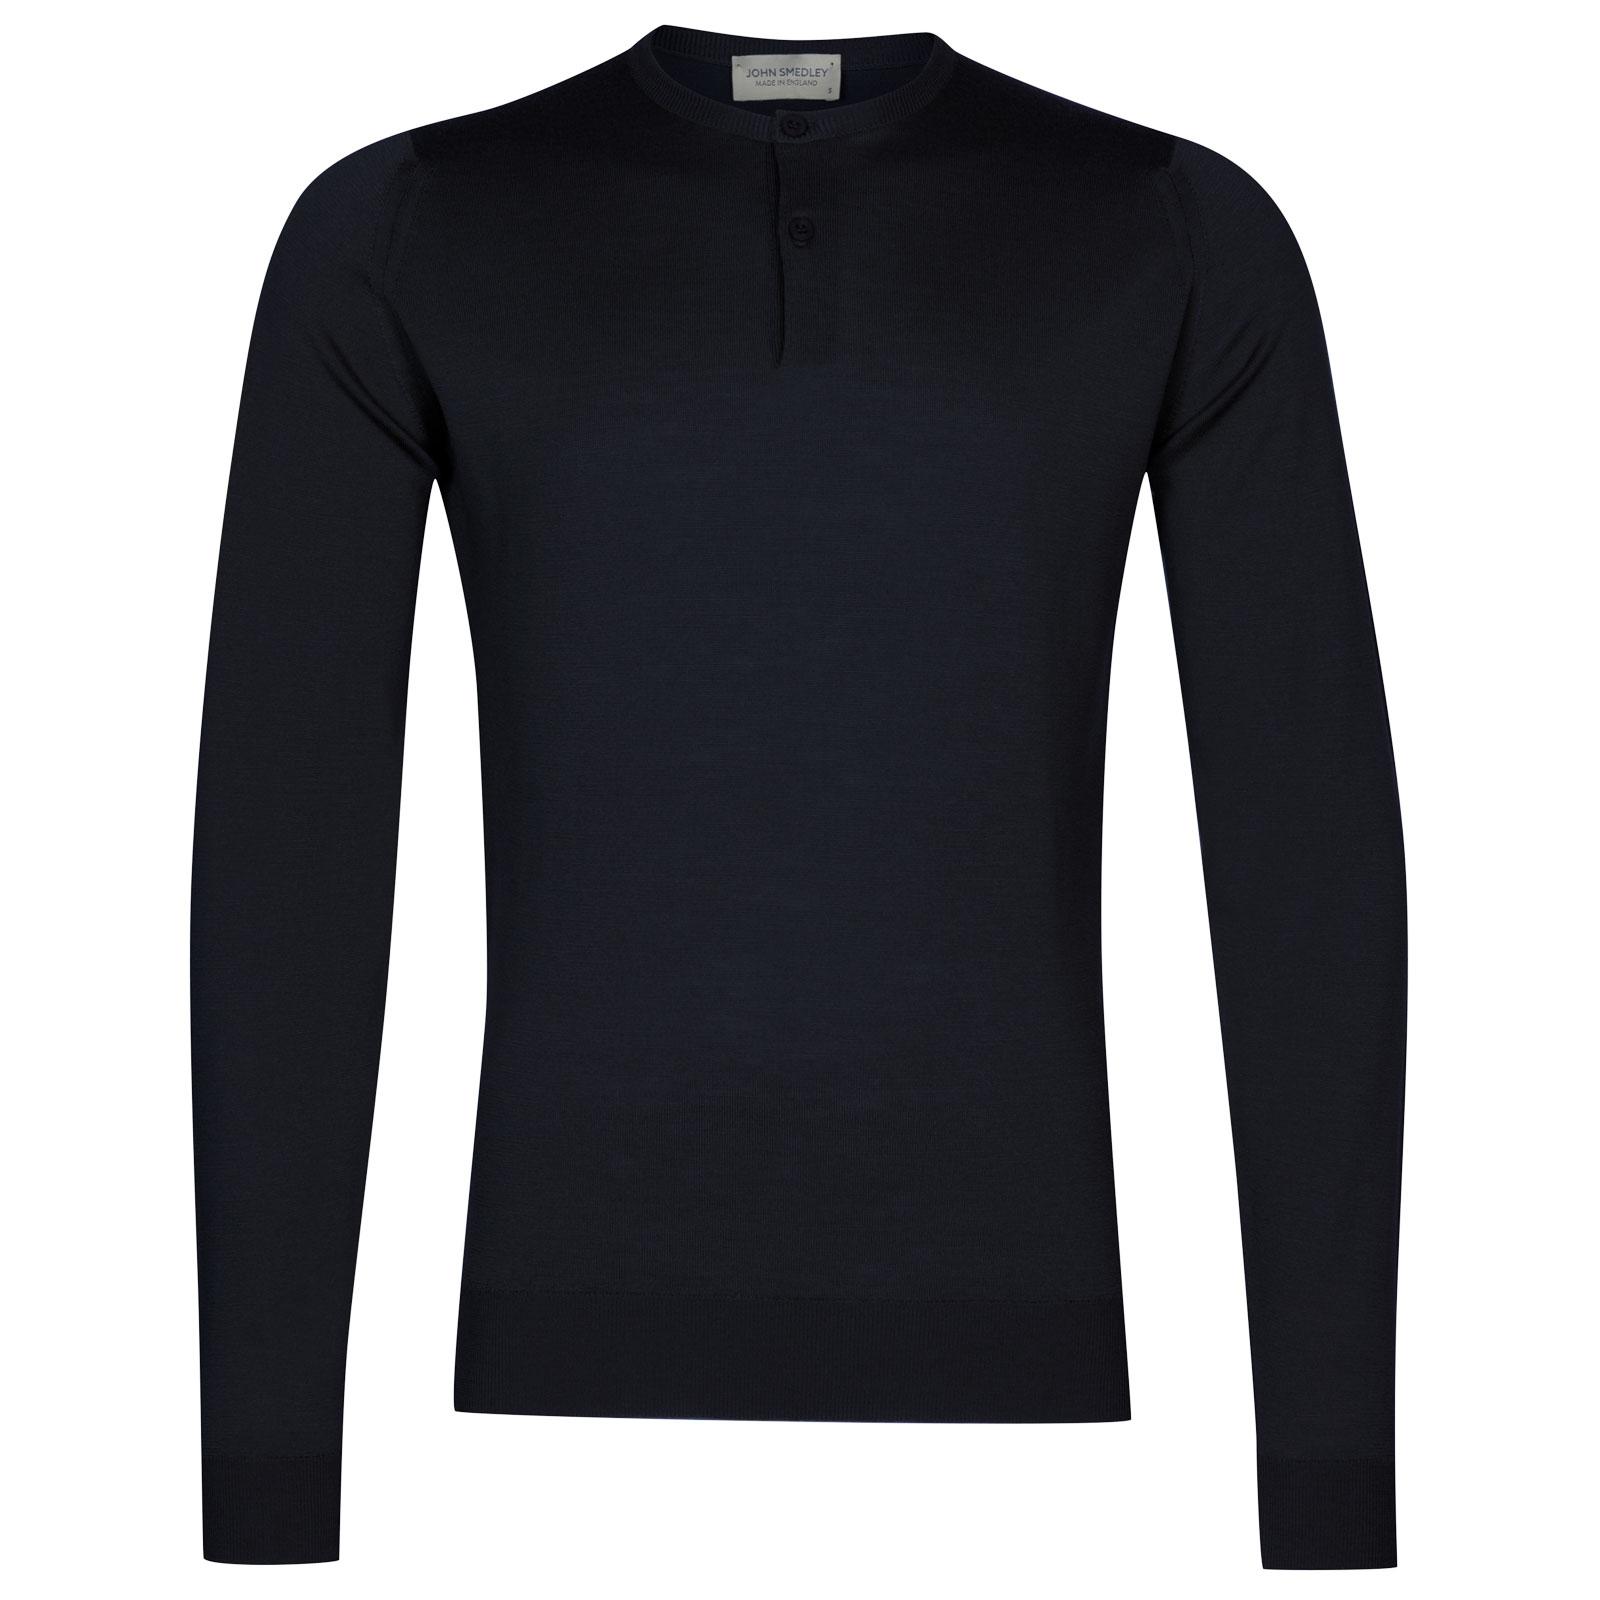 John Smedley russet Merino Wool Henley Shirt in Midnight-XXL